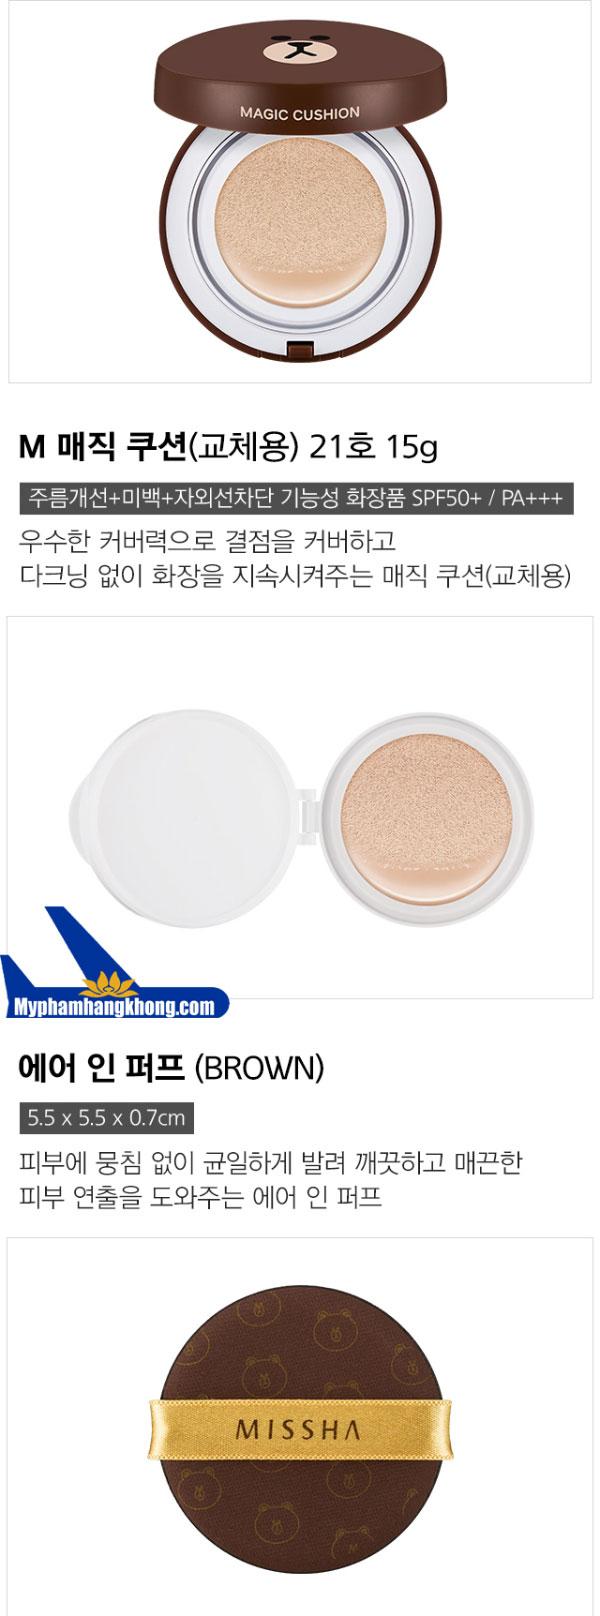 phan-nuoc-kiem-dau-missha-cushion-line-friends-gau-brown-3